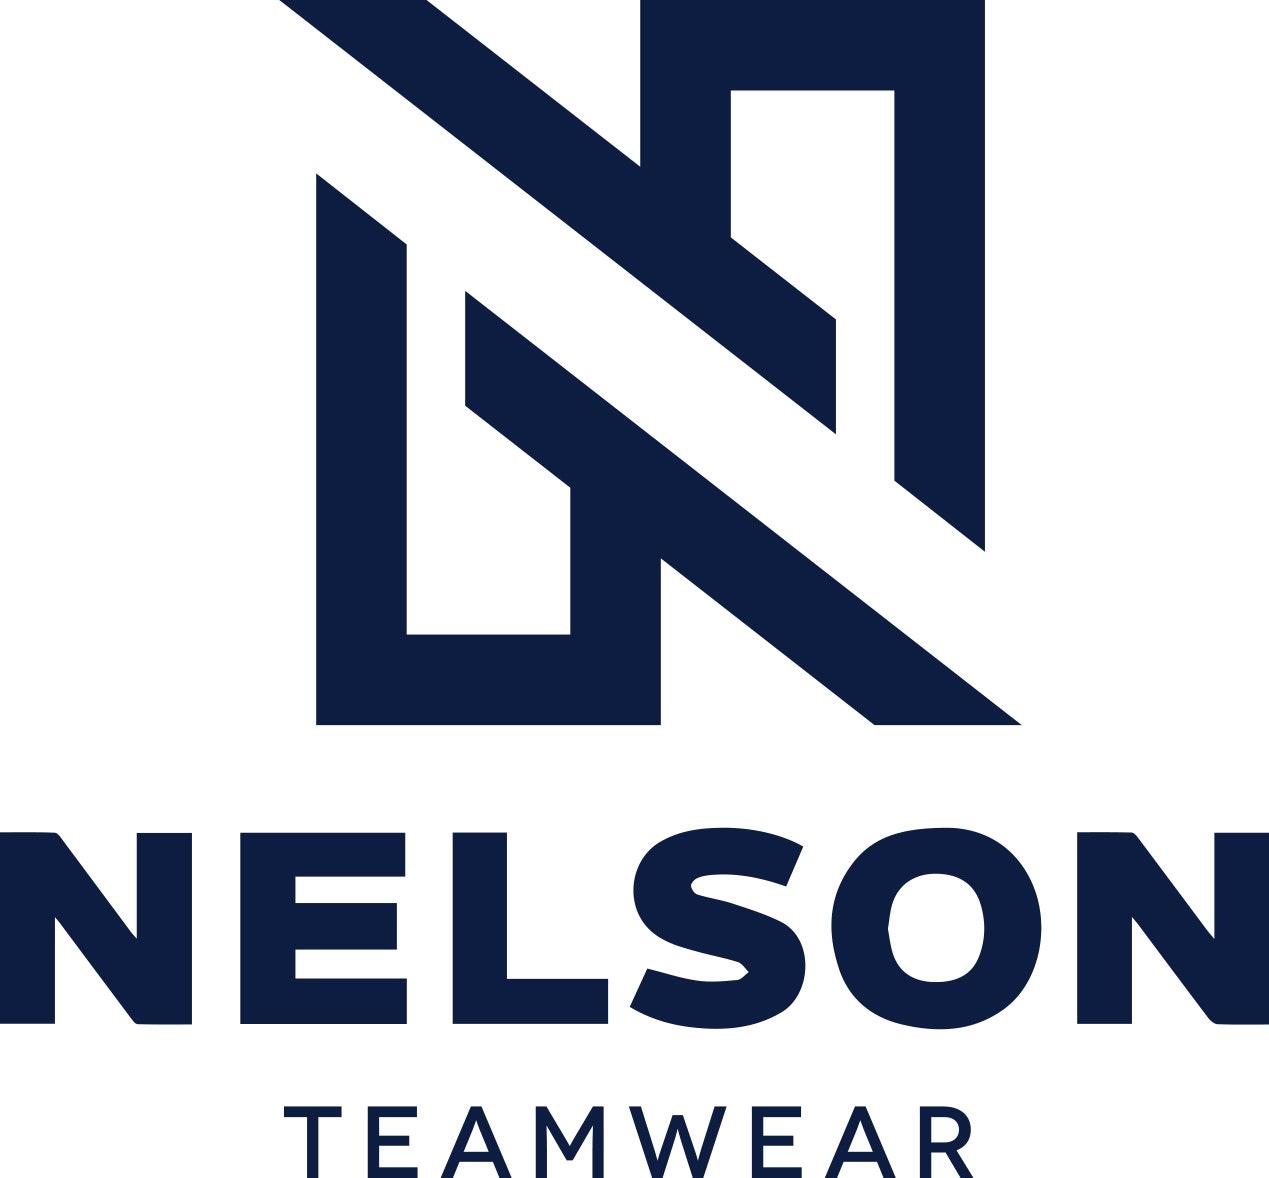 Nelson Teamwear